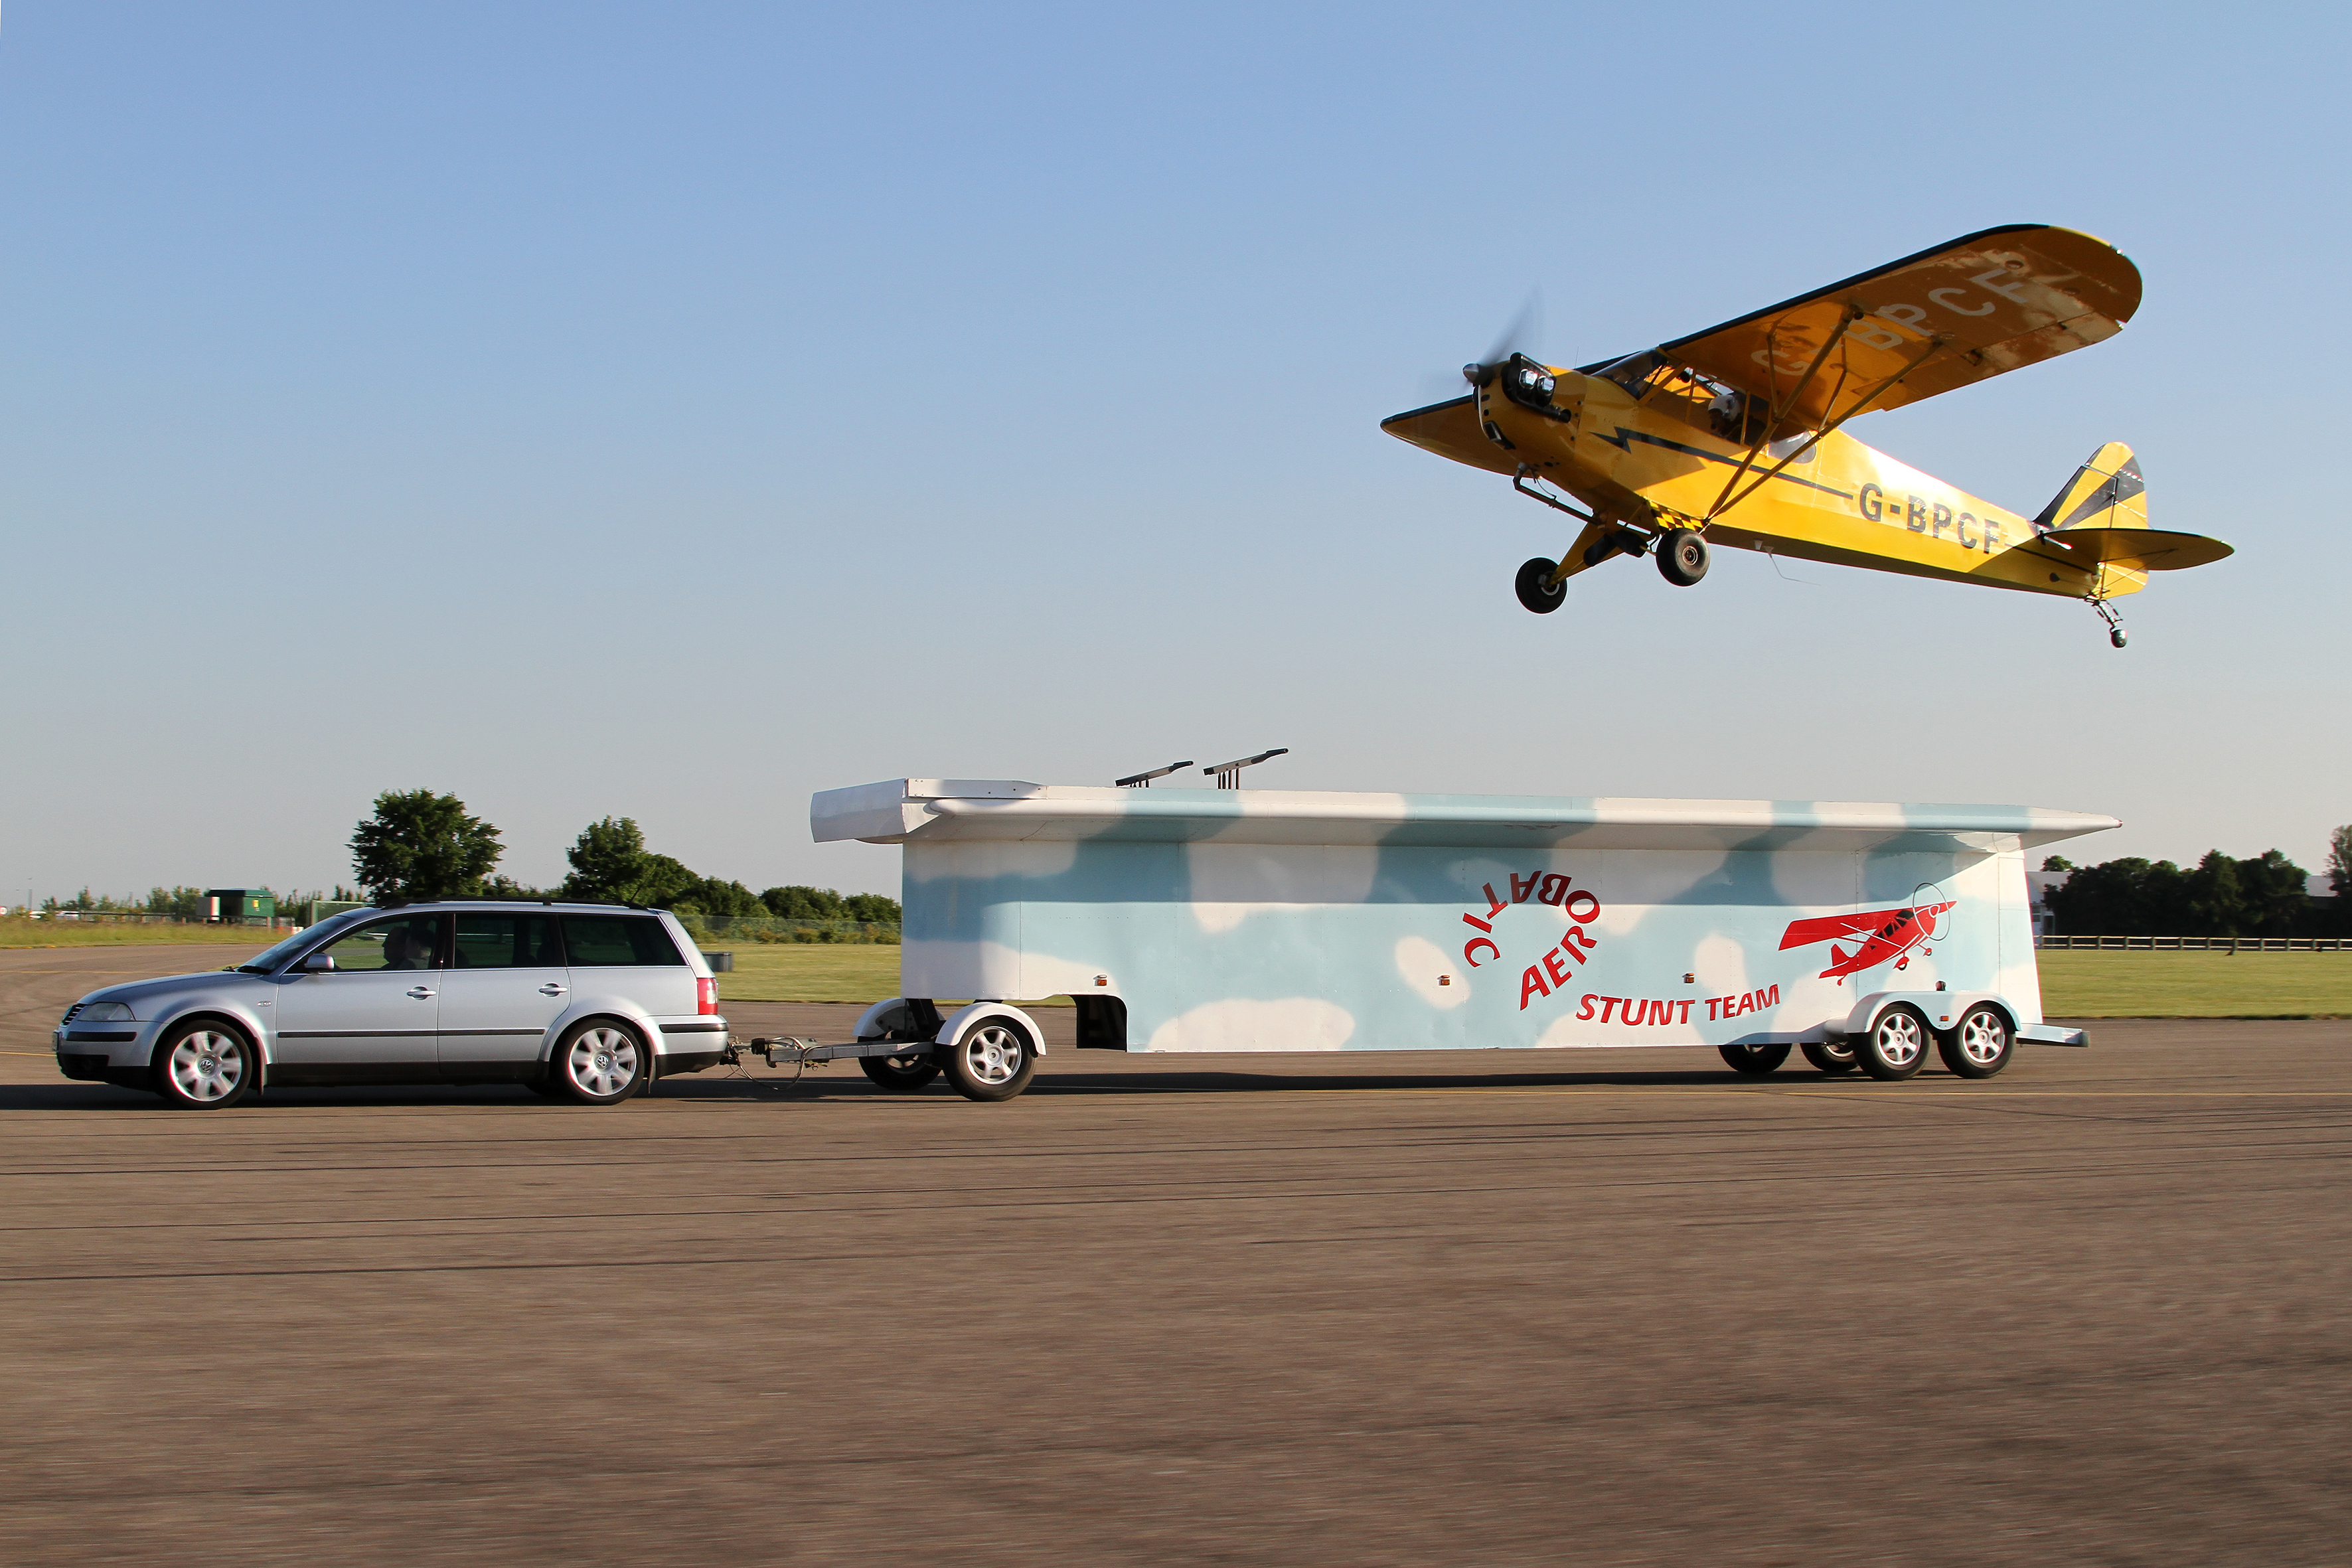 Single-engine piston aerobatics airplane flies over stunt team truck